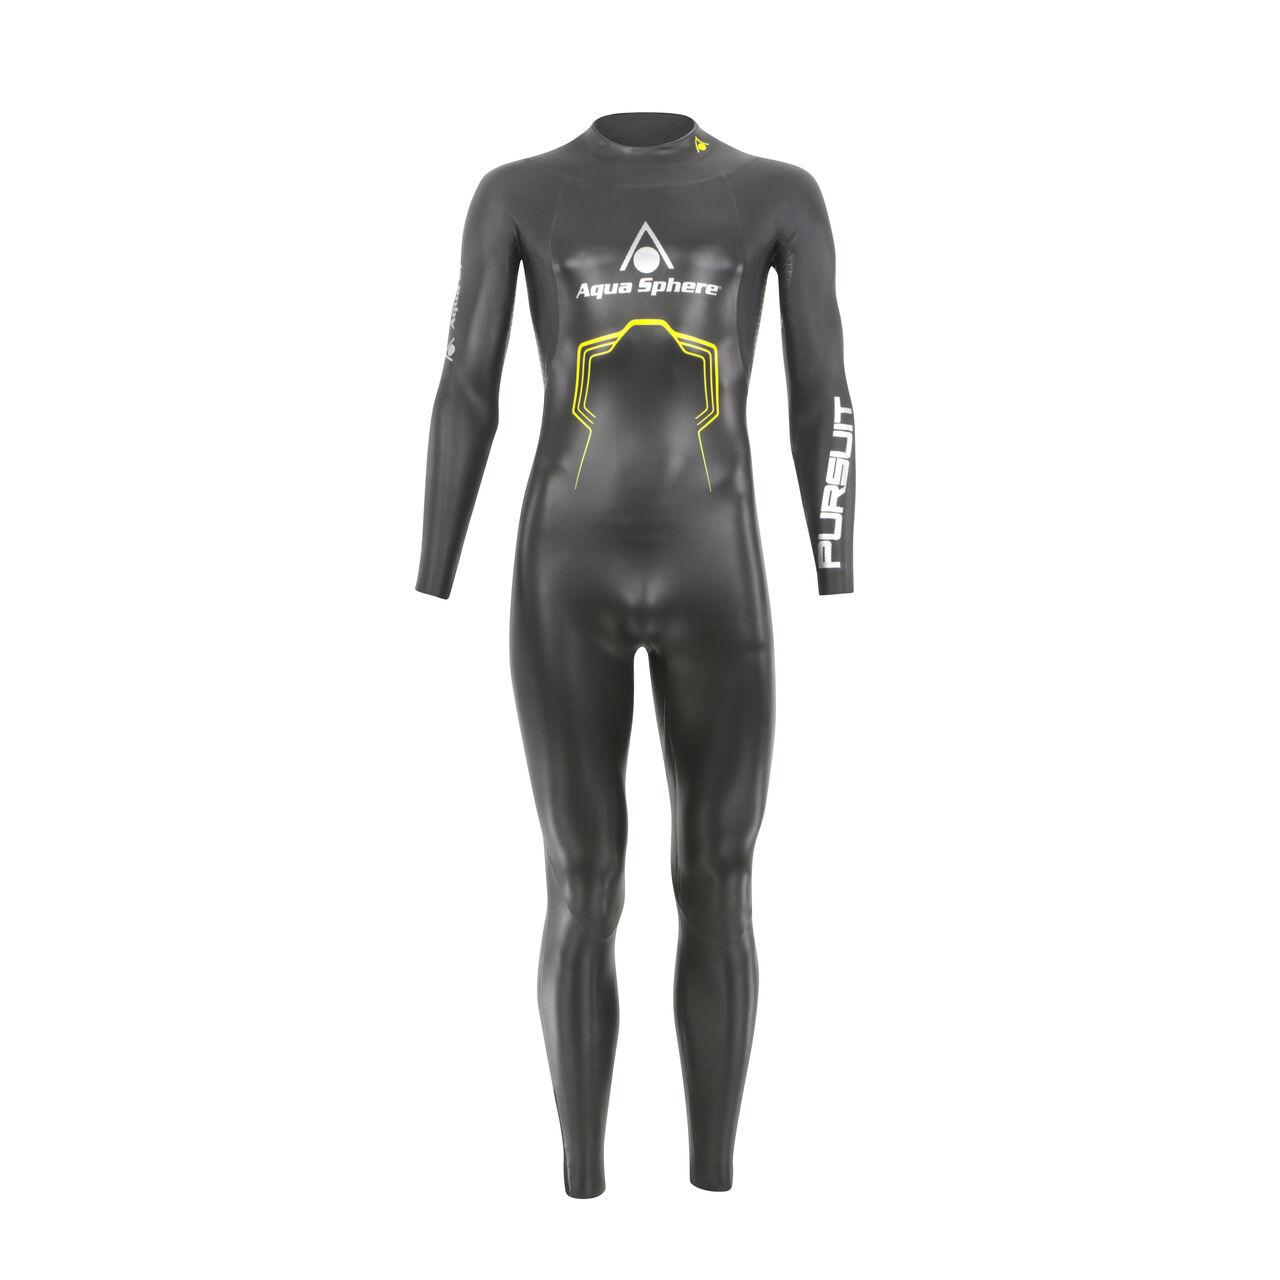 Aqua Sphere Men's Pursuit Wetsuit - 2018